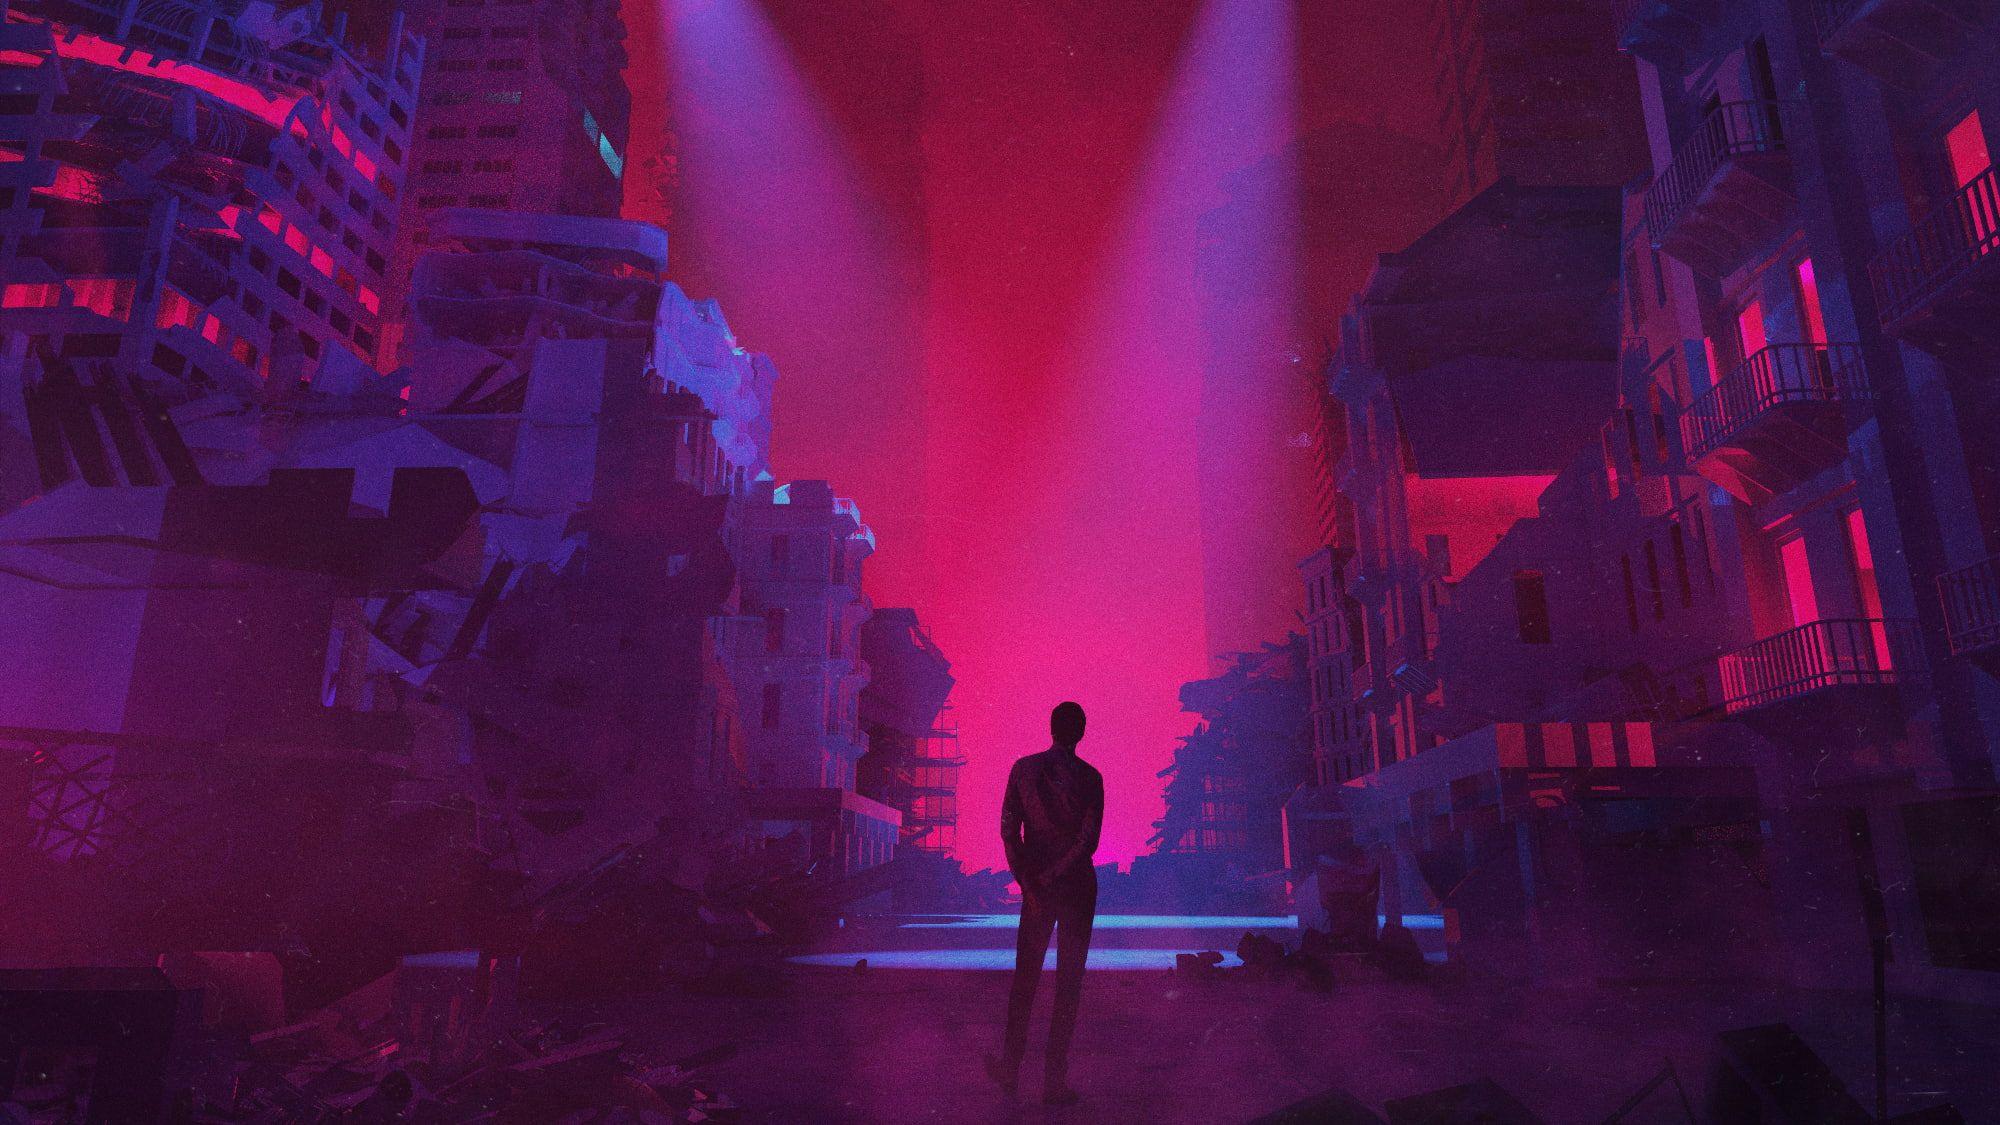 artwork digital art neon building dystopian 1080P wallpaper 2000x1125